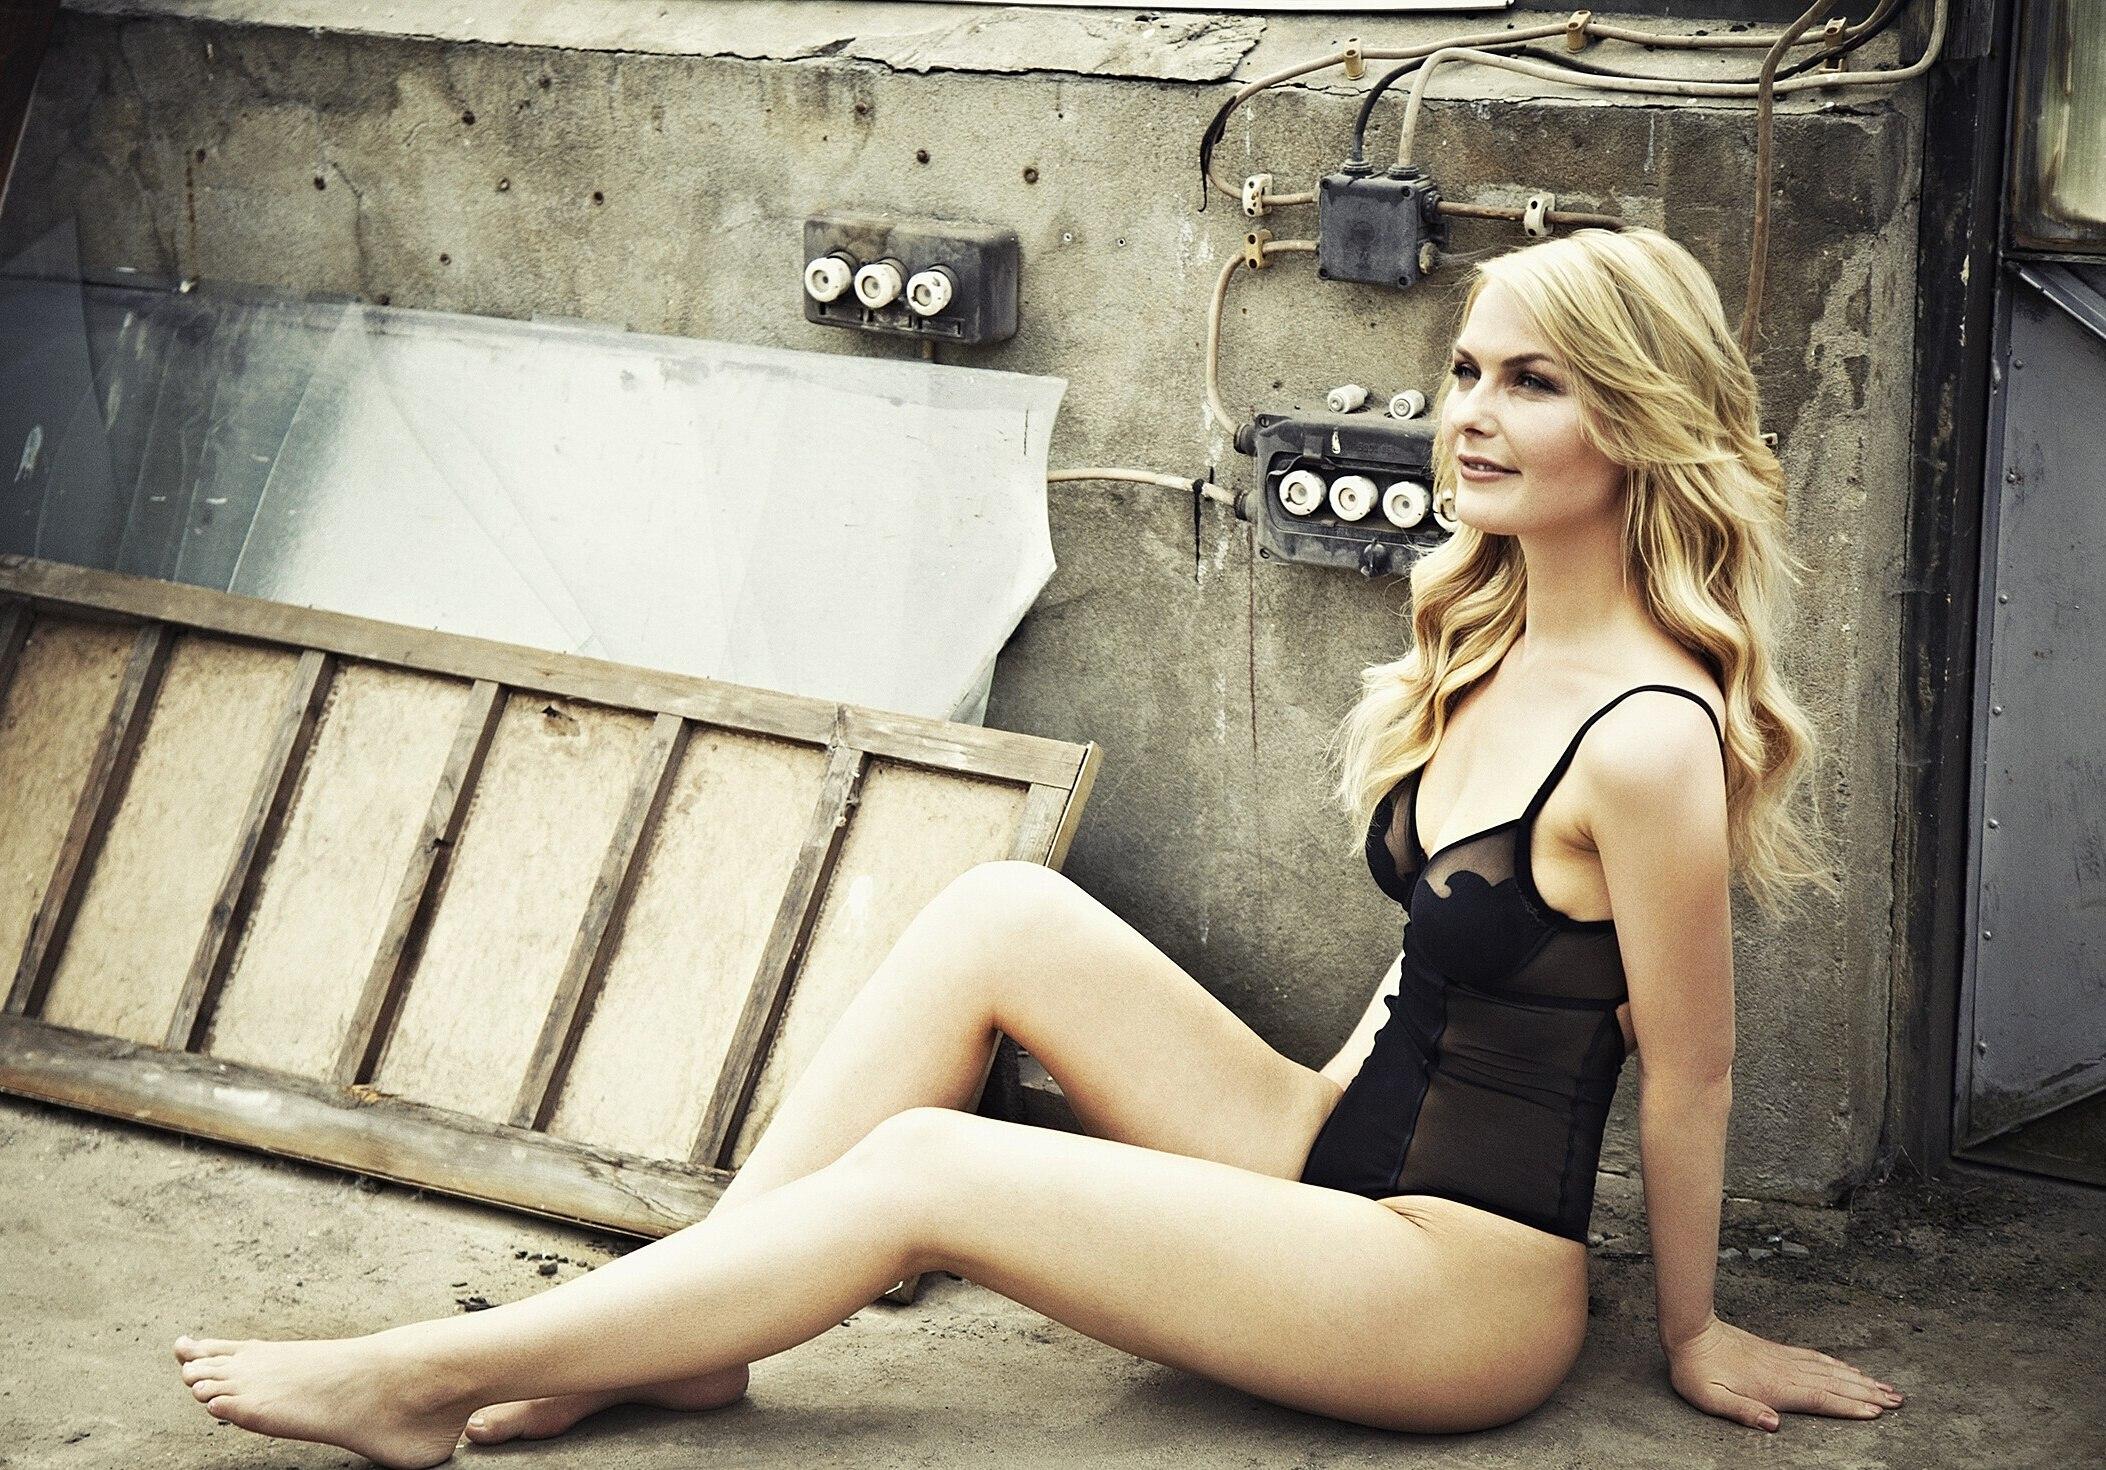 Christiane Weden - Playboy Girl October 2015 (part 2